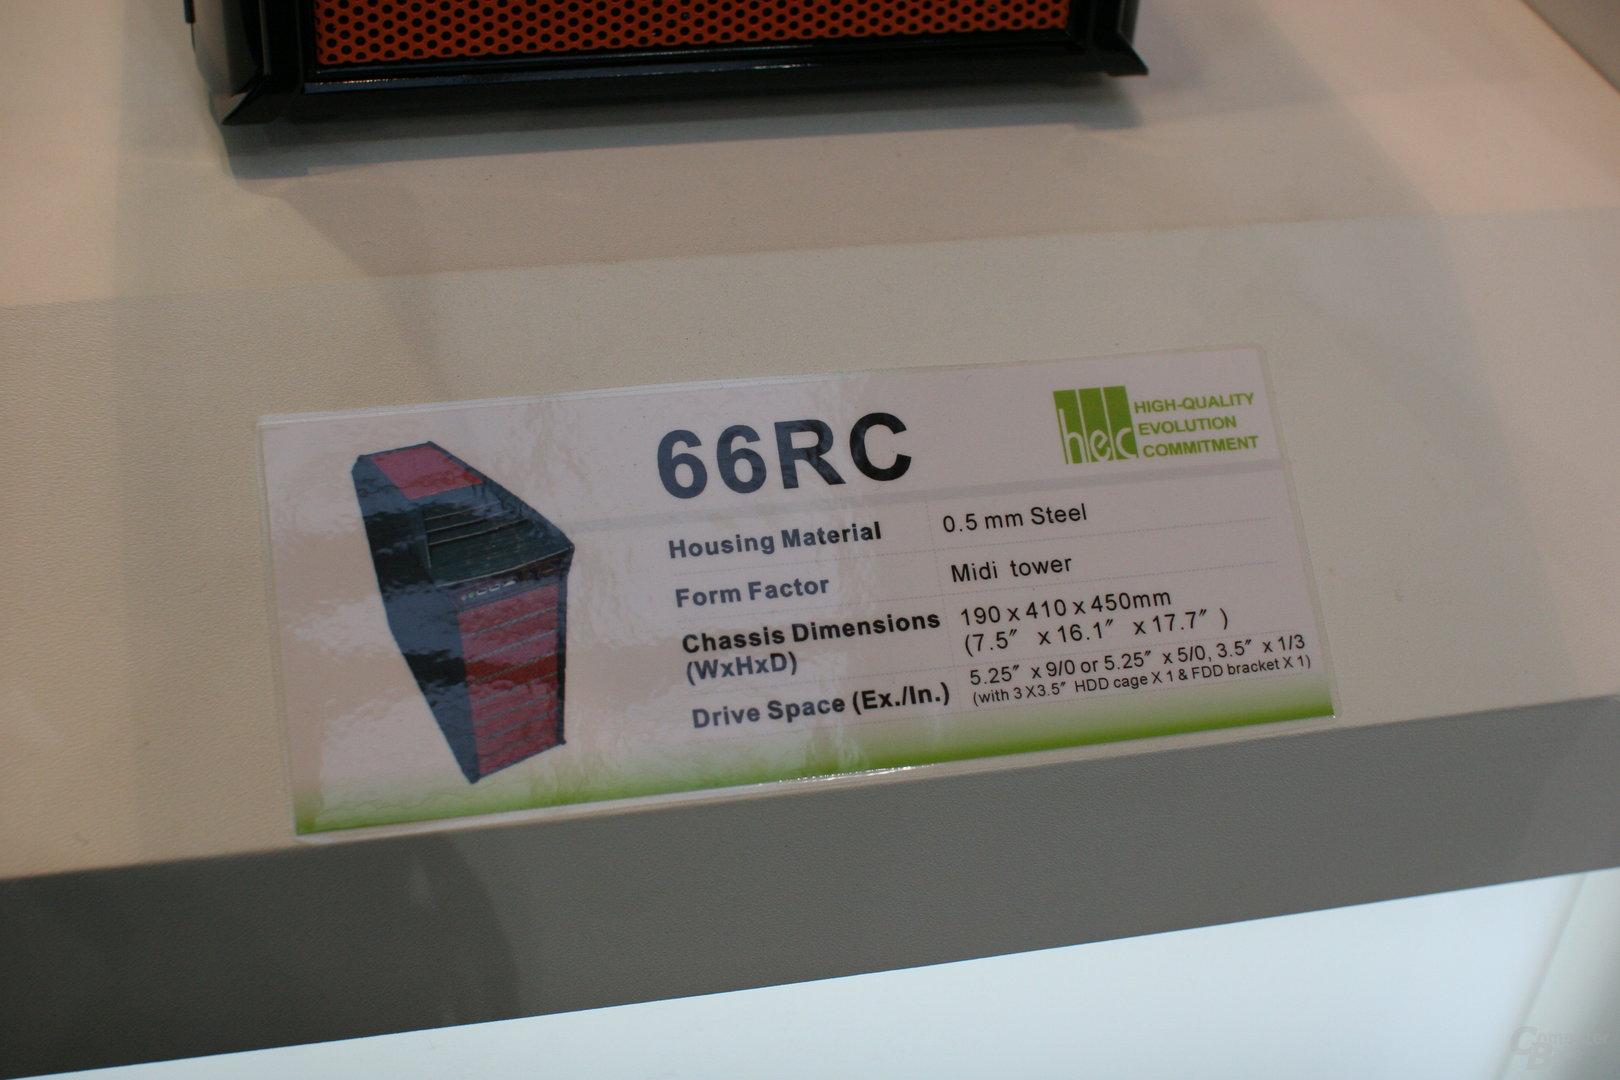 HEC Compucase 66RC